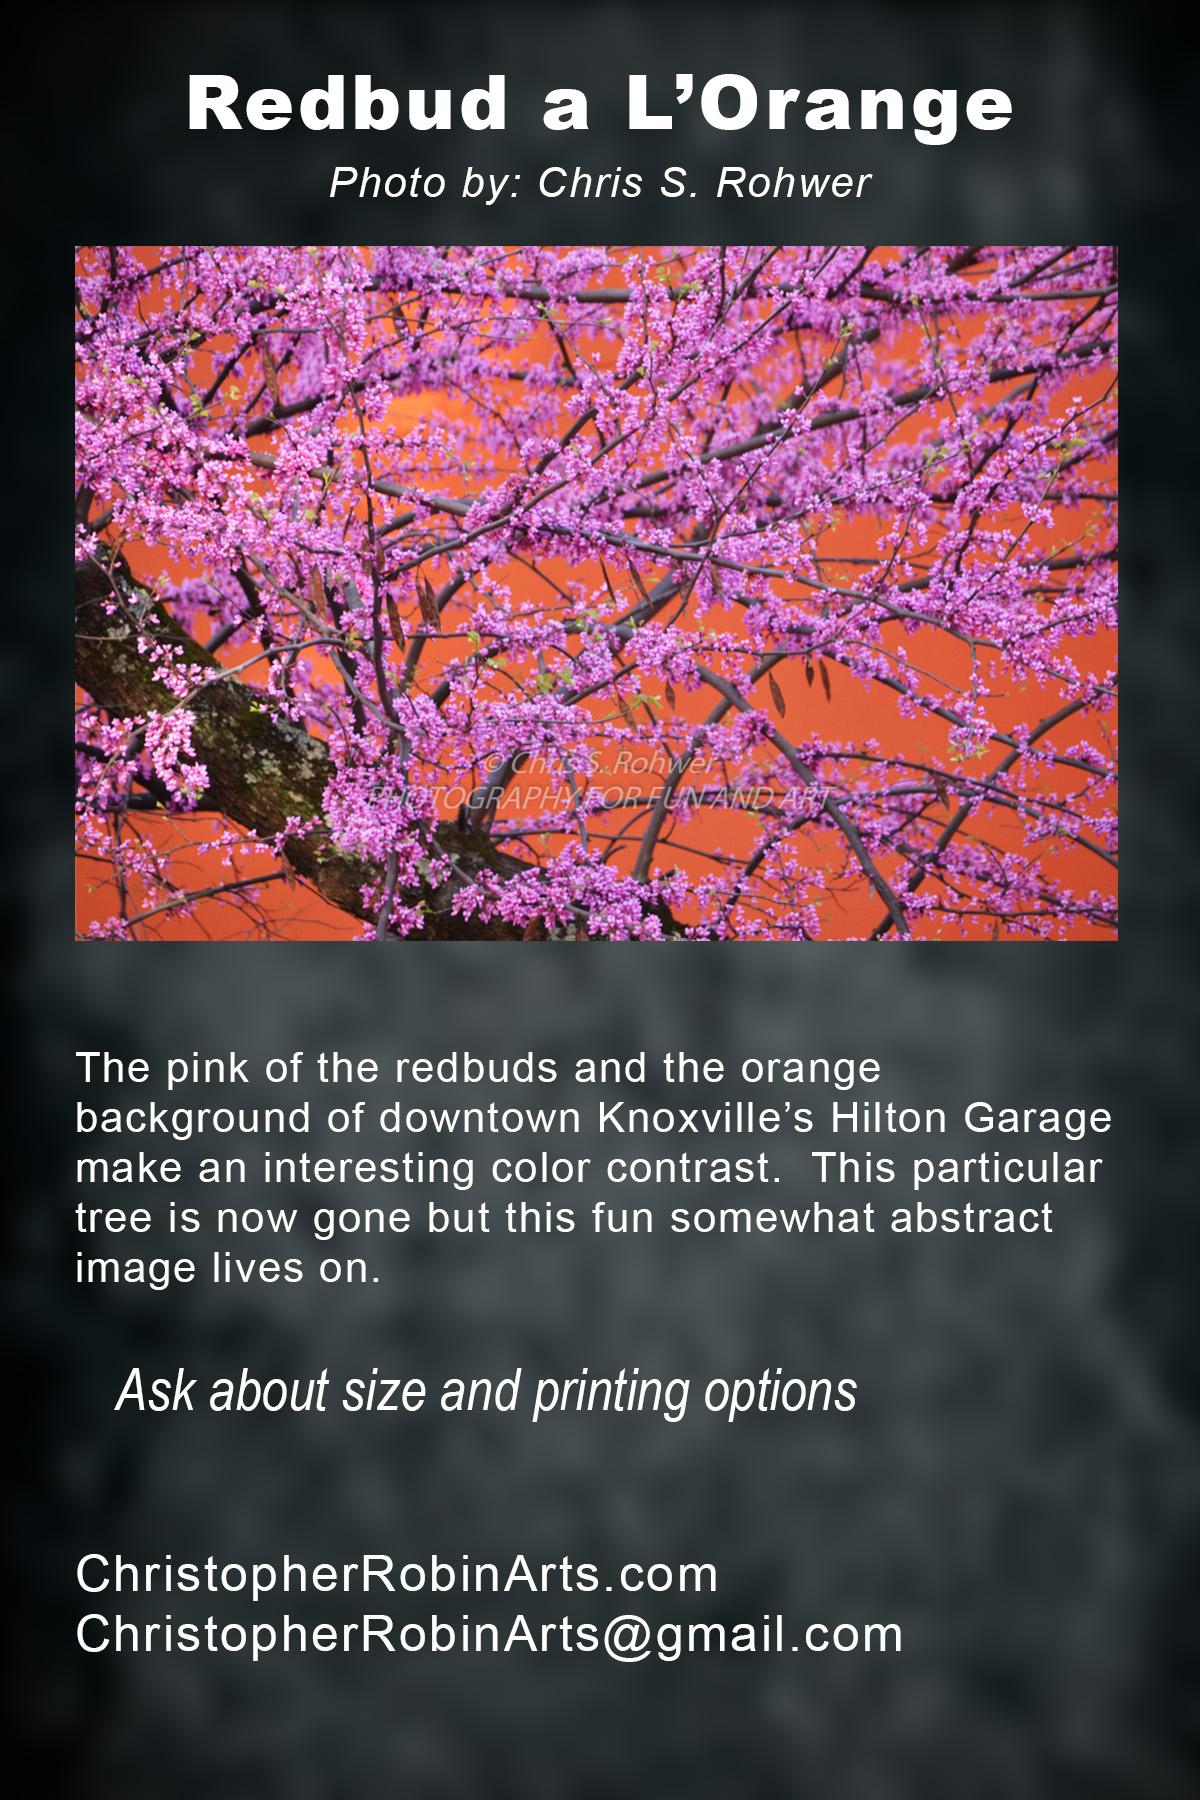 Redbud a l'Orange.jpg